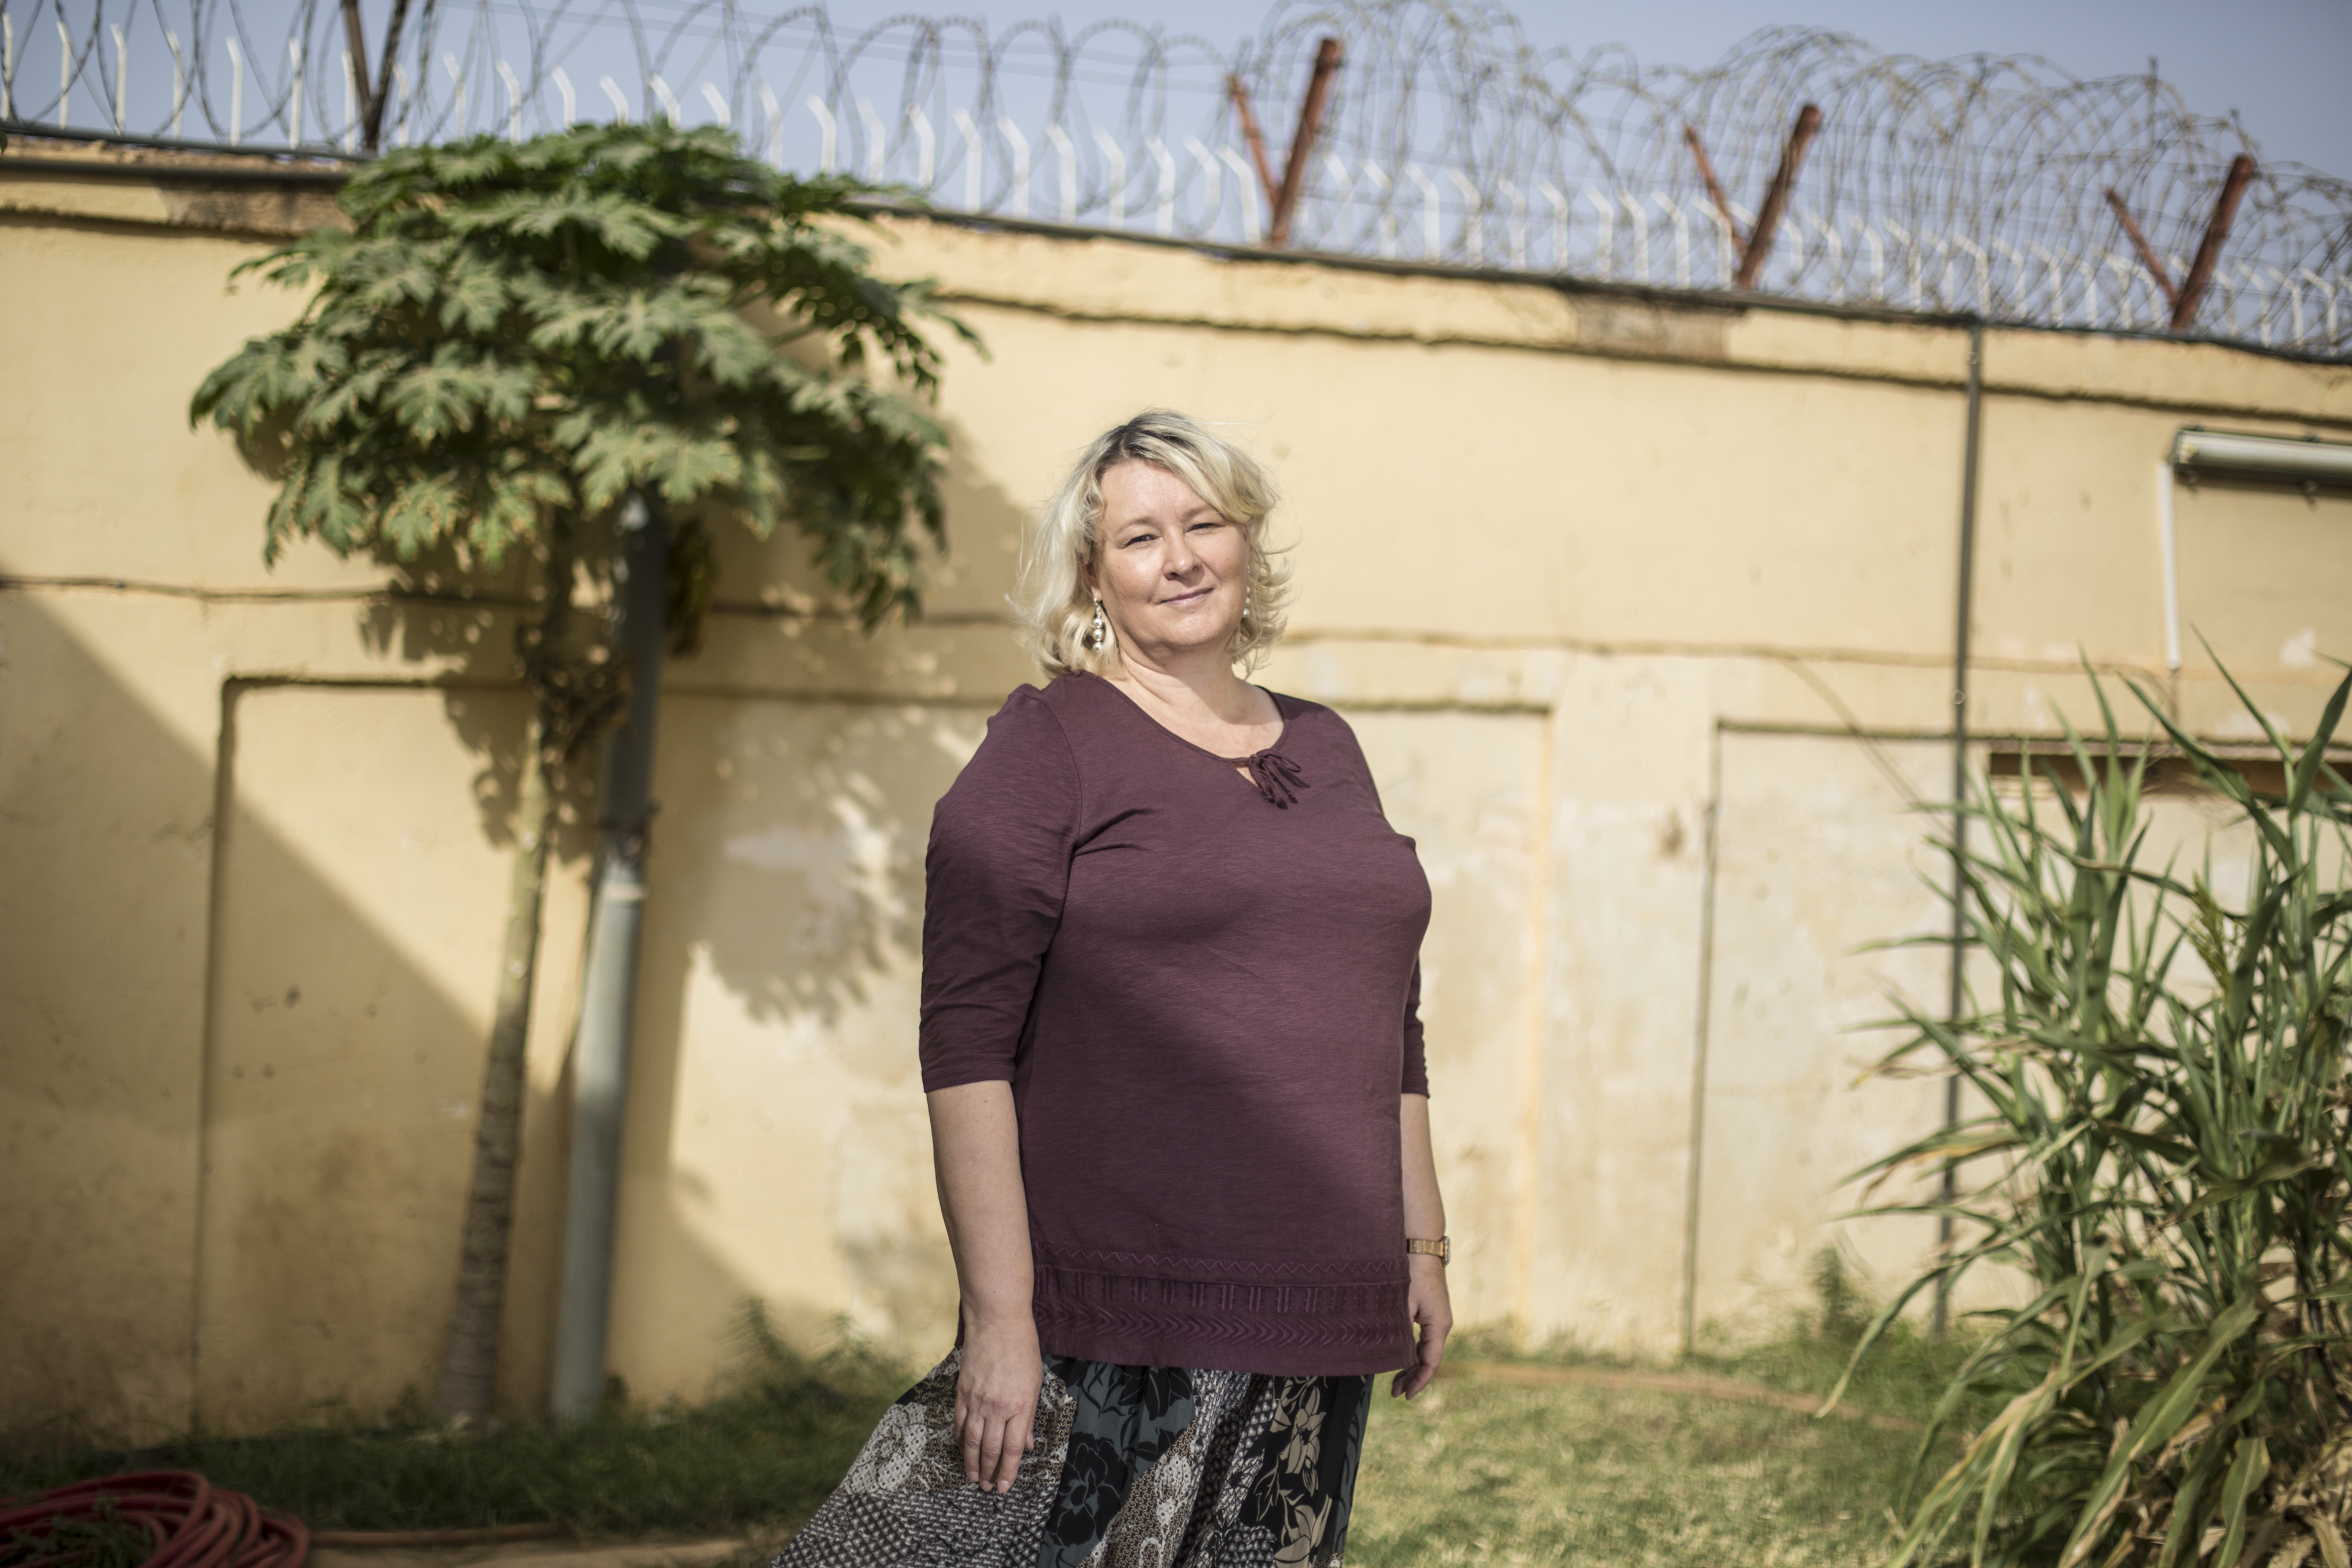 Kirsi Henriksson on johtanut Nigerissä EU:n siviilikriisinhallintaoperaatiota.